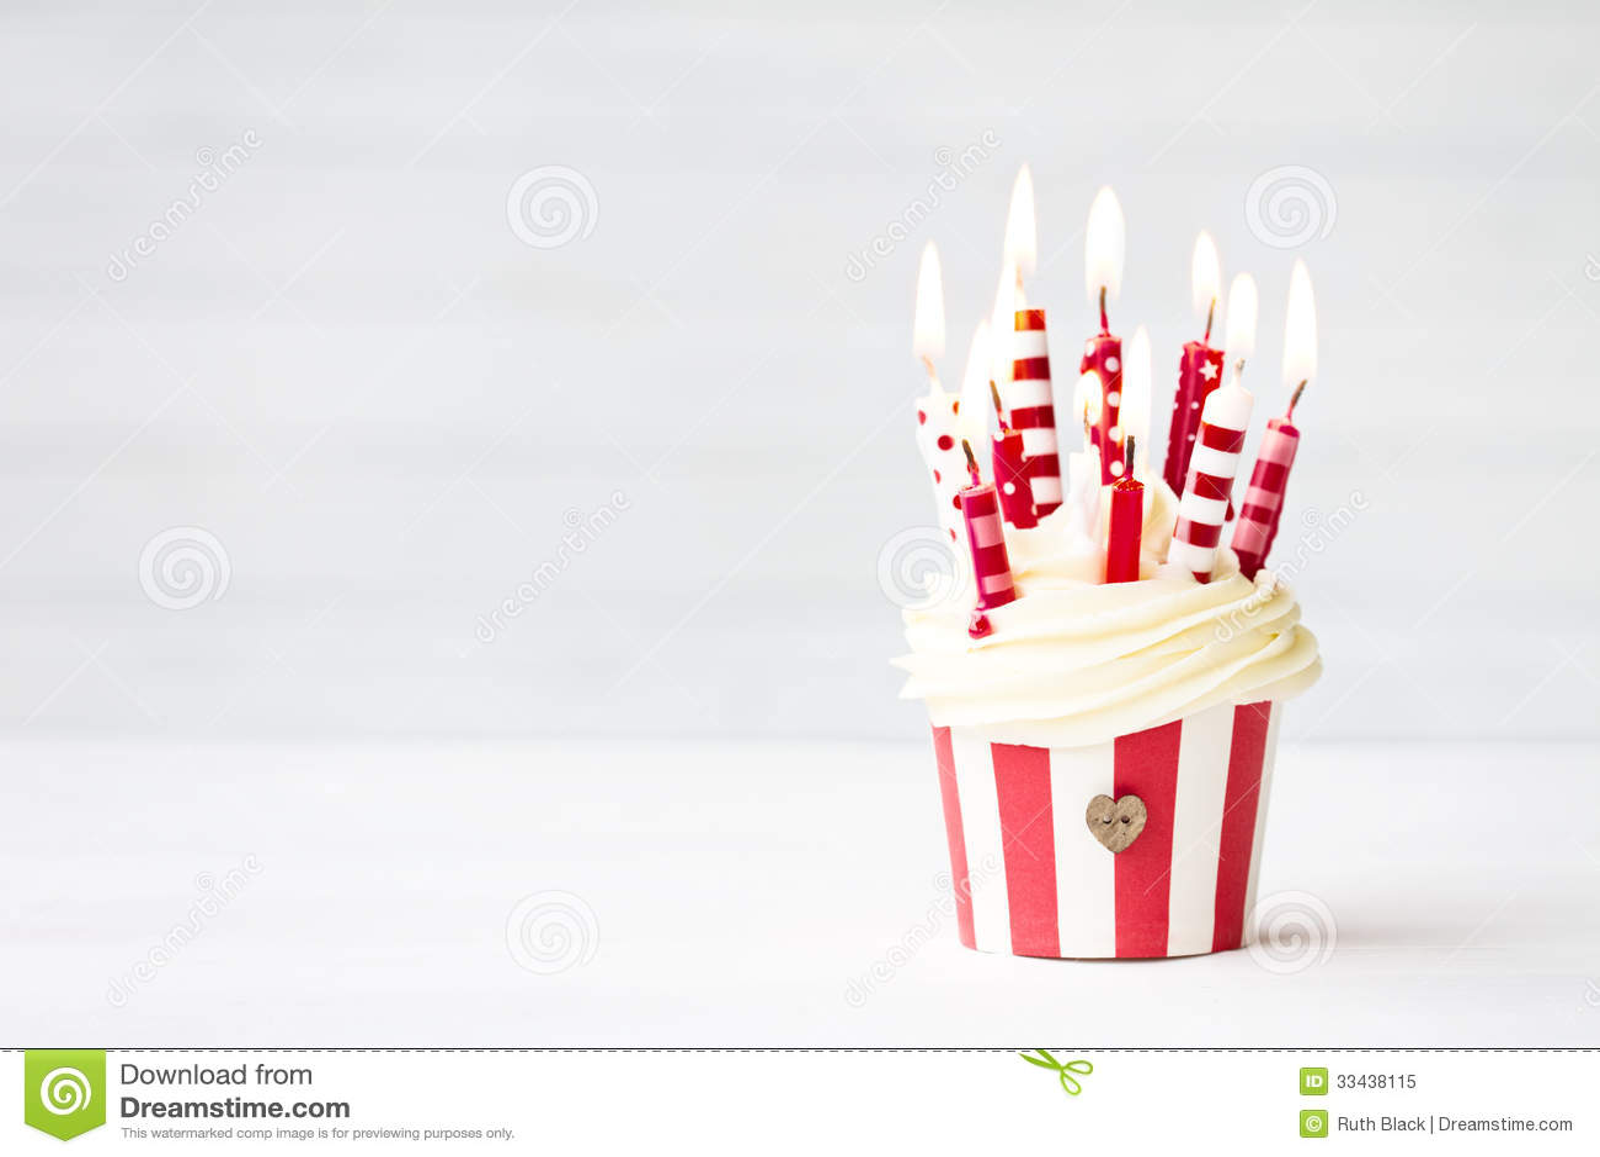 Birthday Cupcake Royalty Free Stock Photo Image 33438115